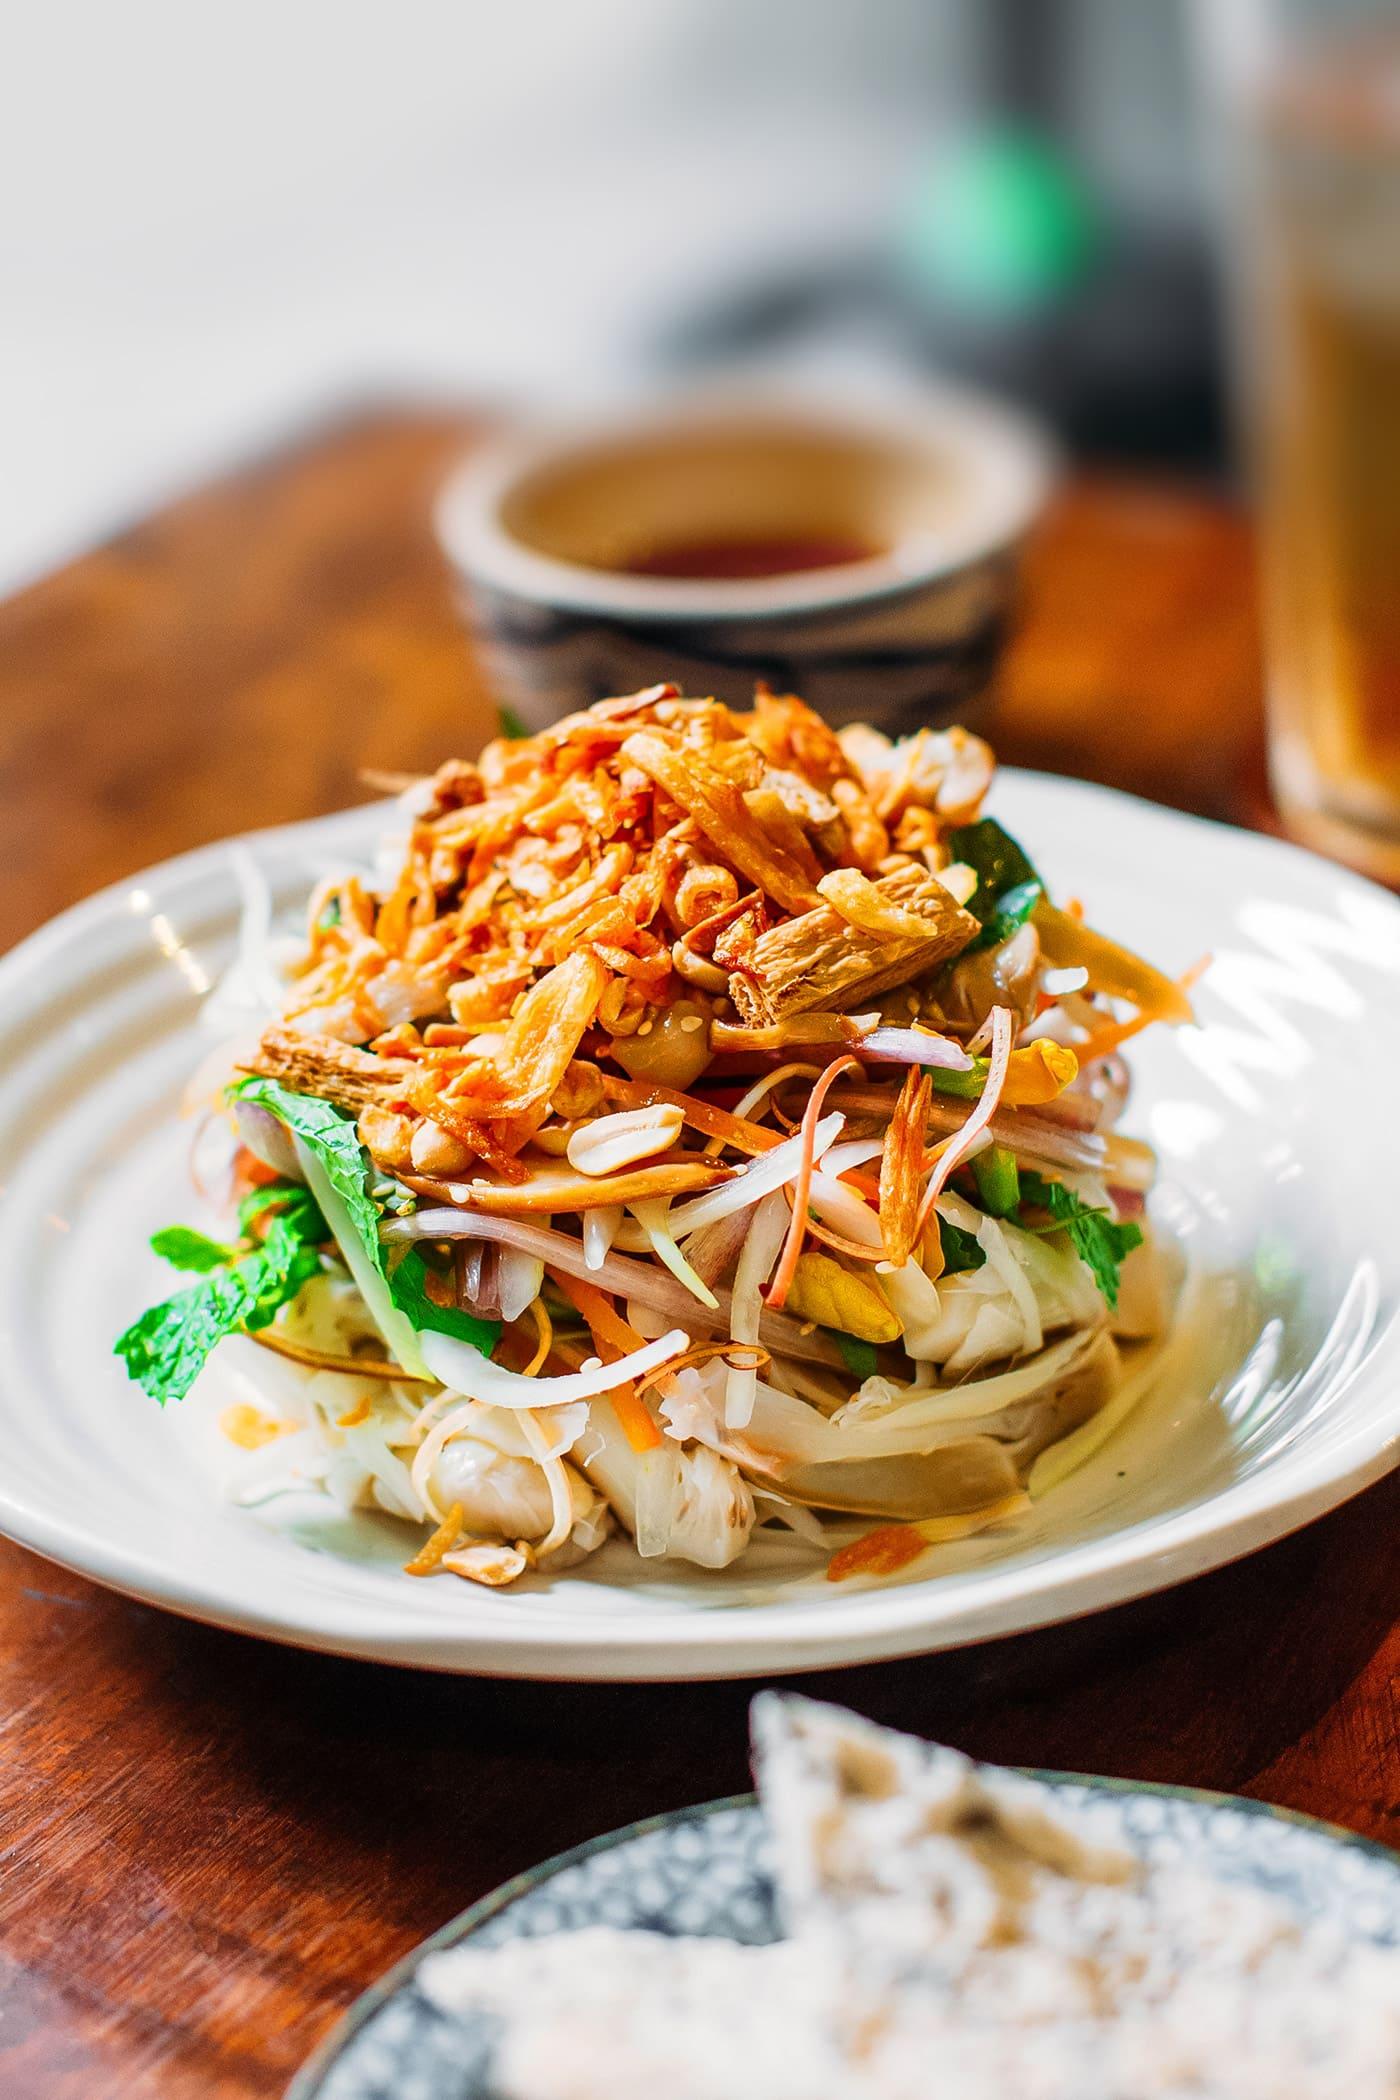 A Guide to Eating Vegan in Viet Nam - Gỏi Mít